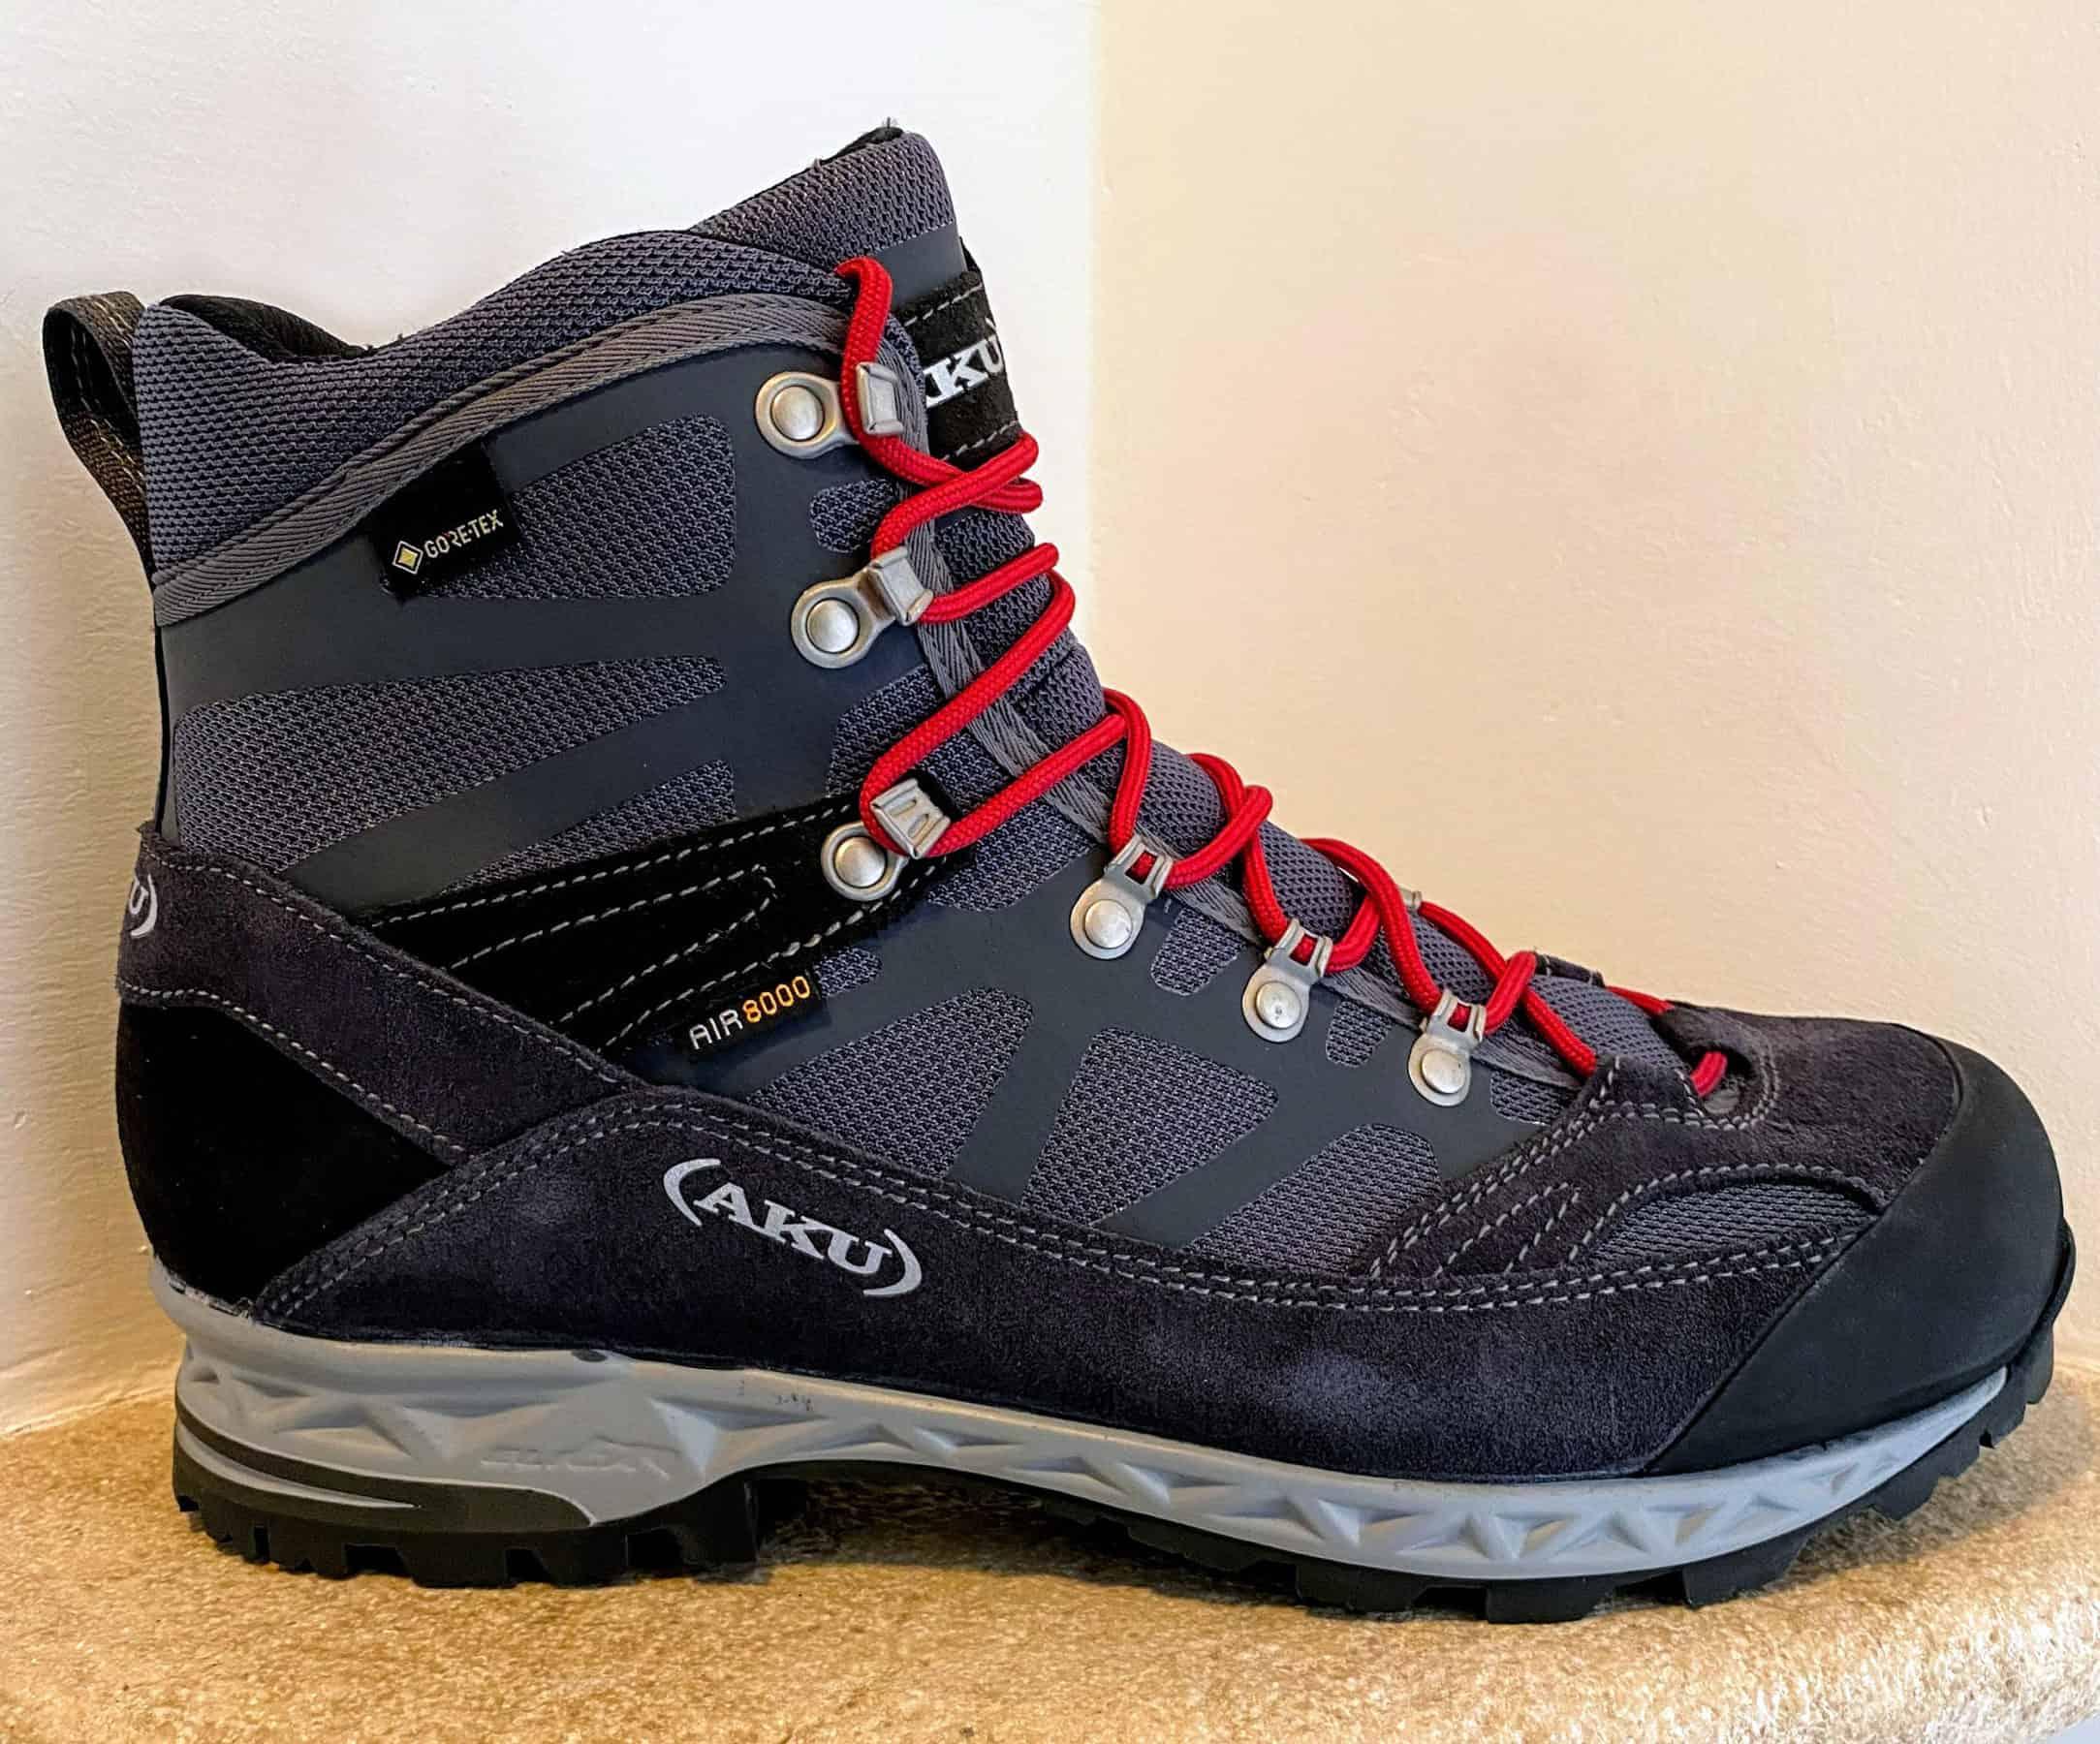 AKU Trekker Pro GTX forma ergonomica